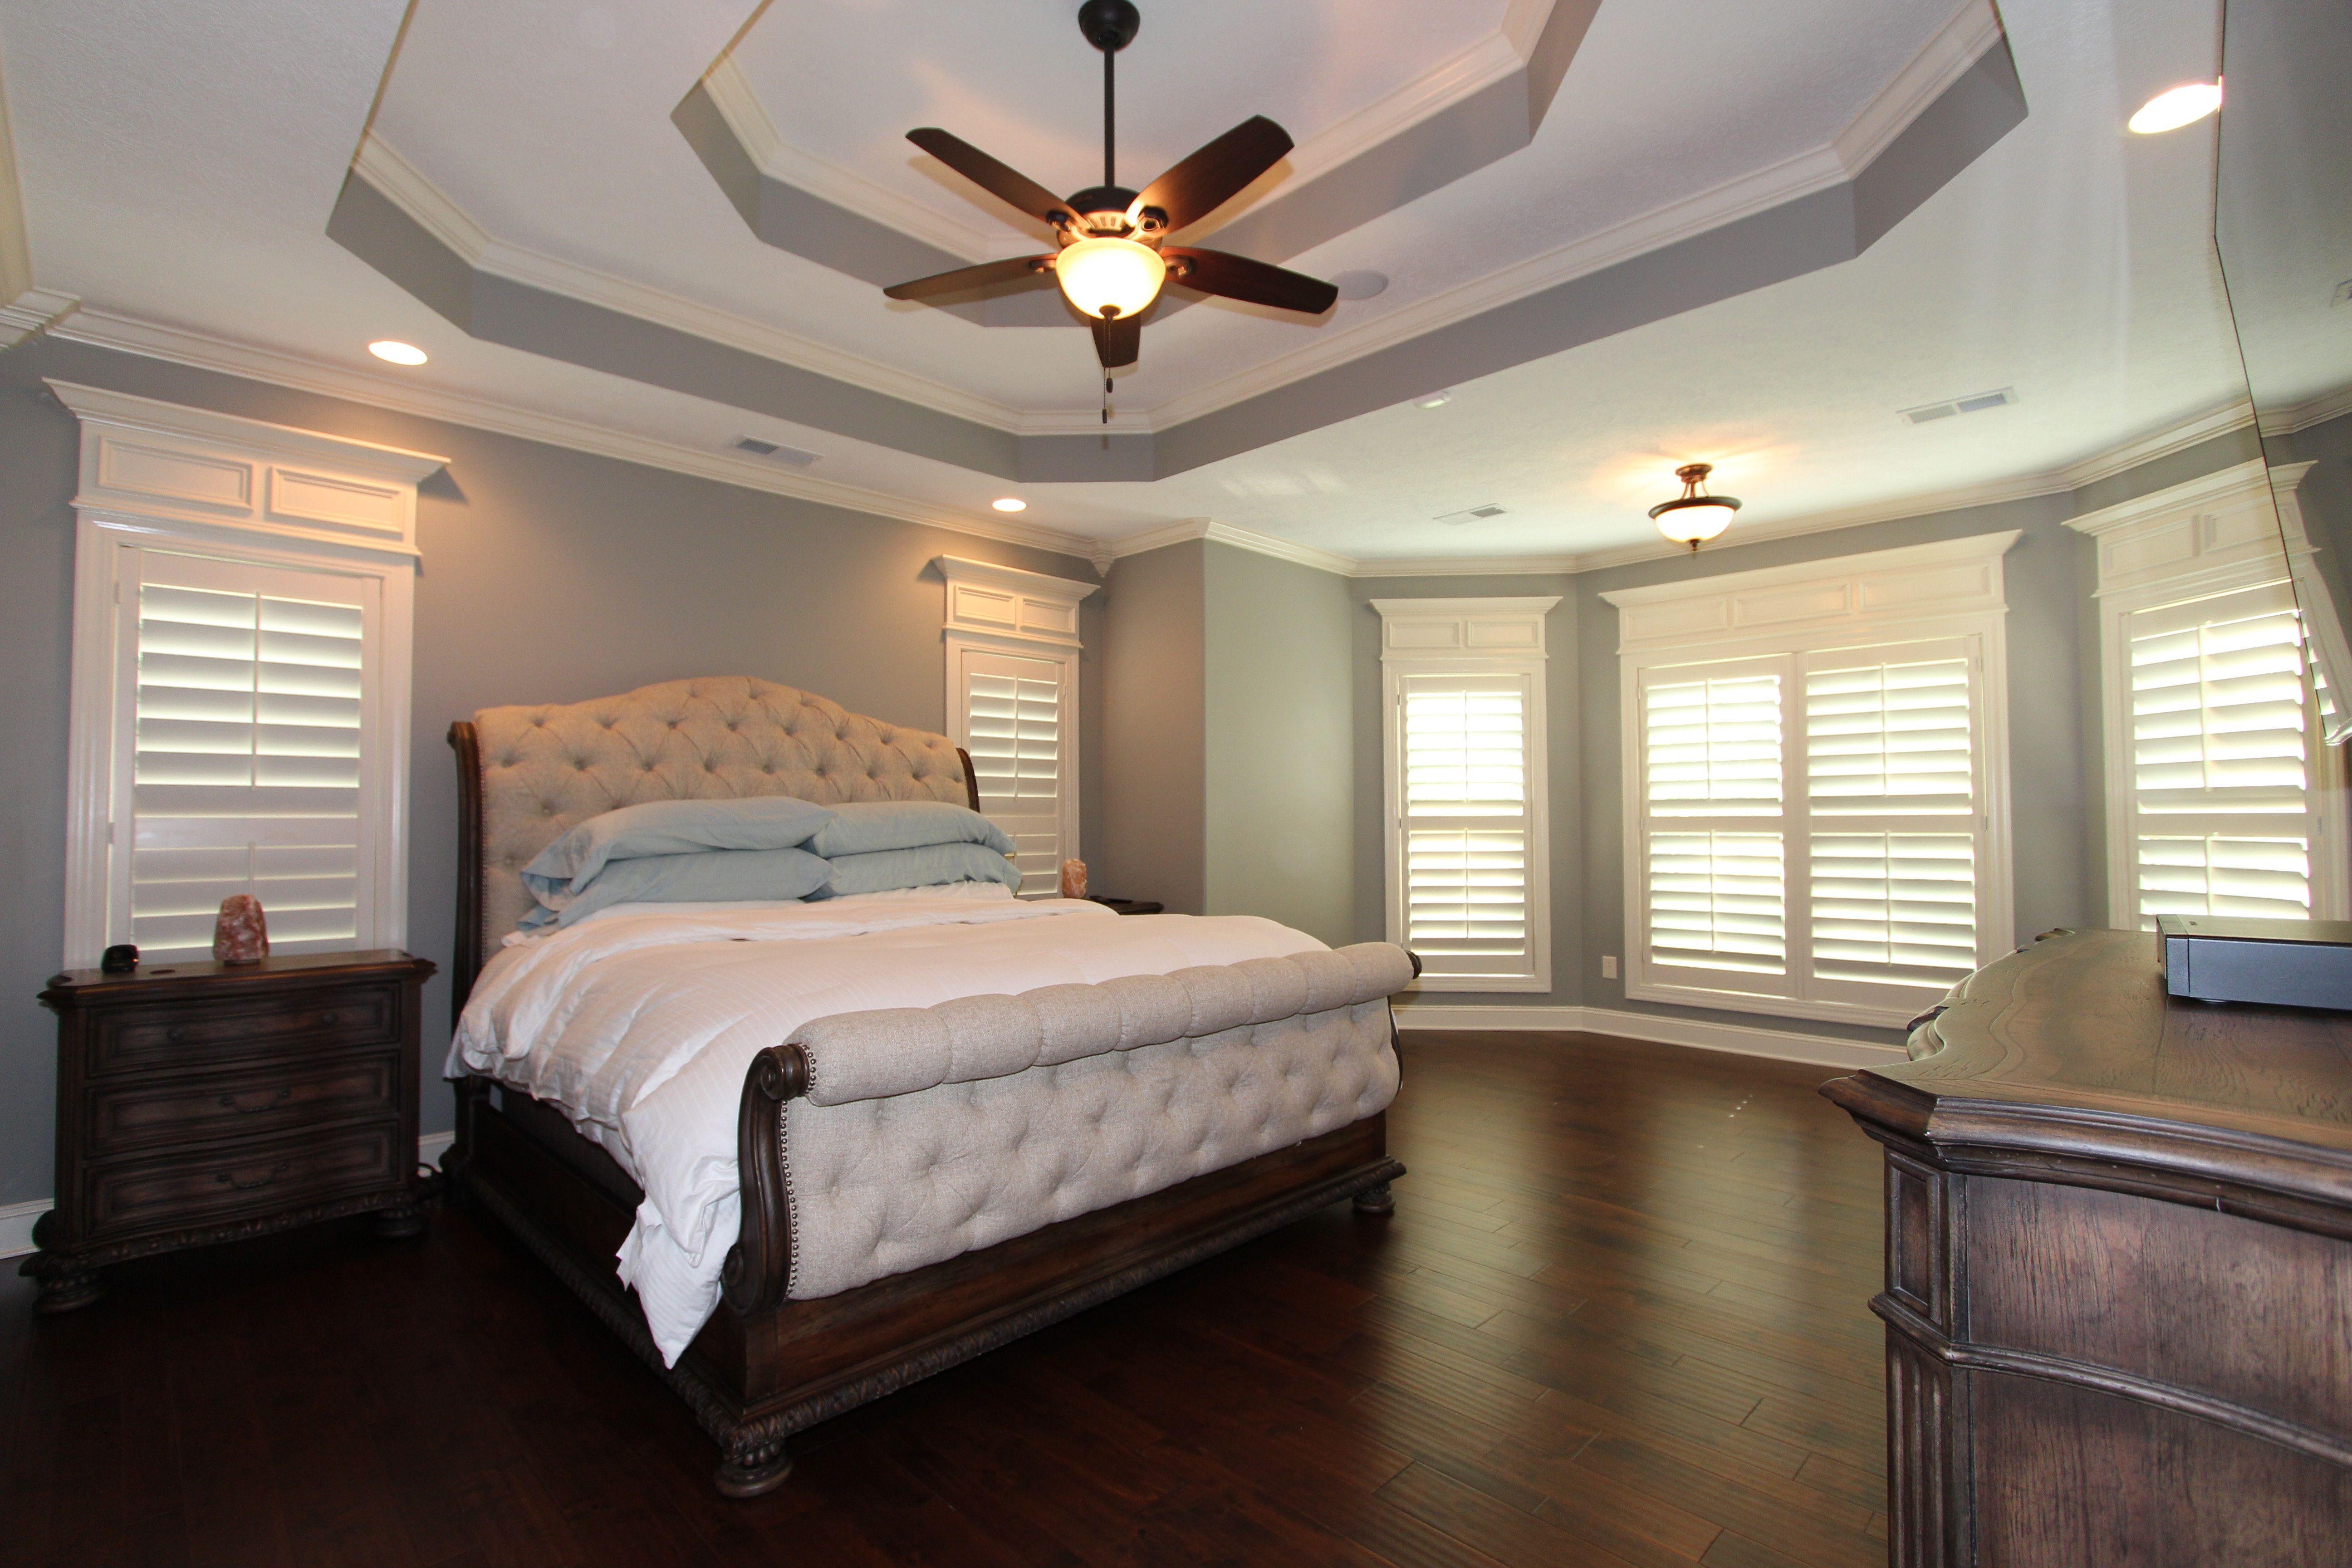 Aesthetic Bedroom Wallpapers Top Free Aesthetic Bedroom Backgrounds Wallpaperaccess